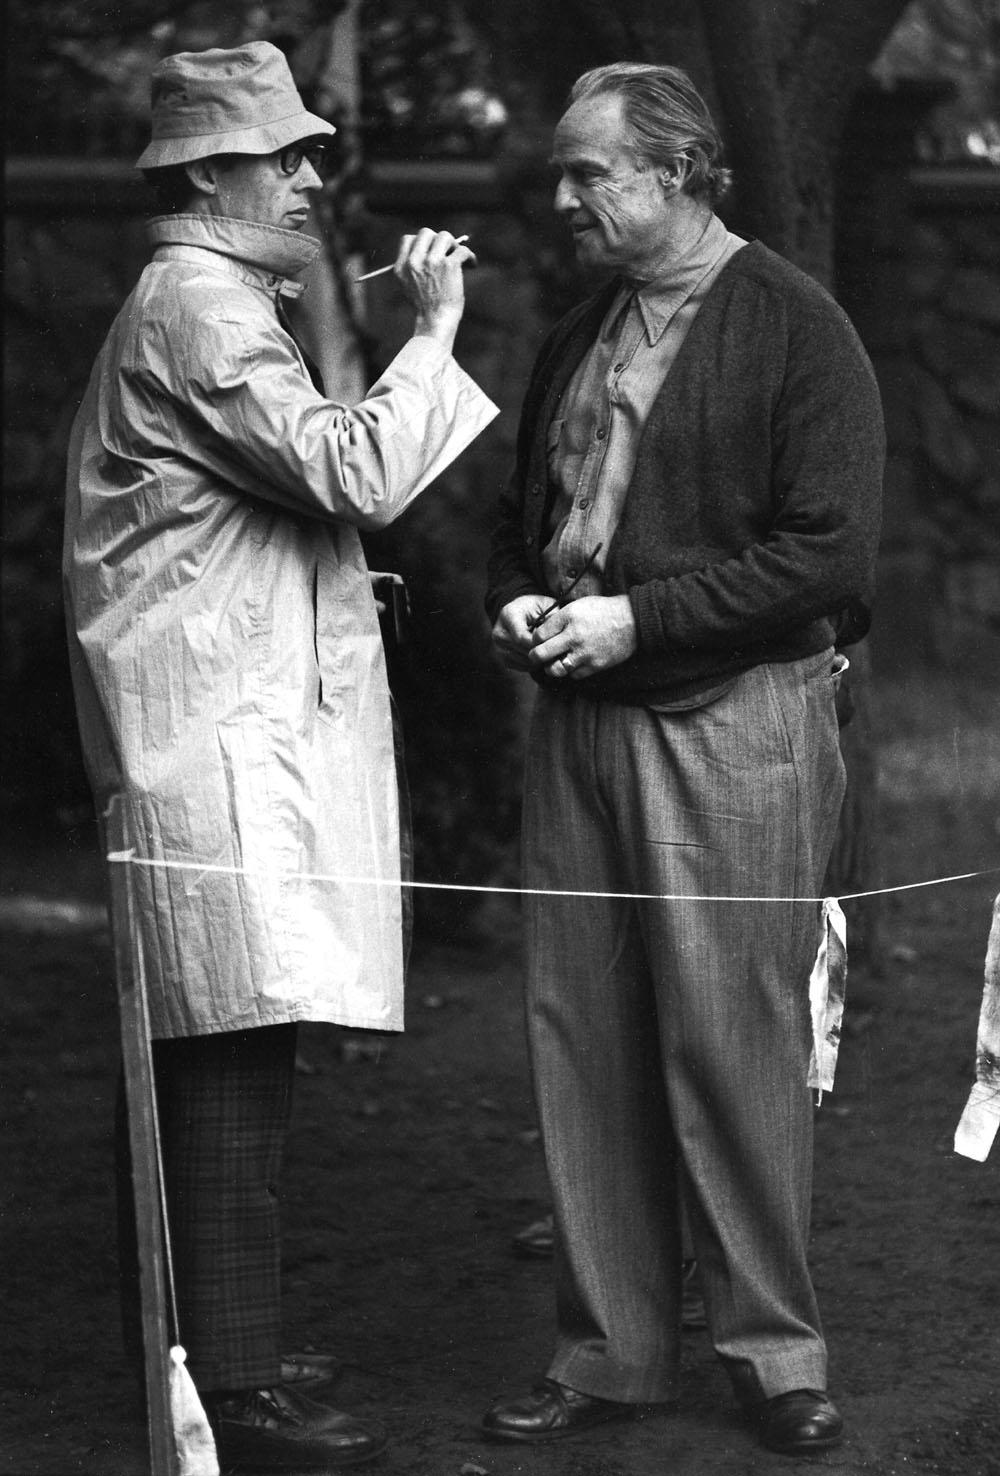 Dick Smith, Marlon Brando on The Godfather set